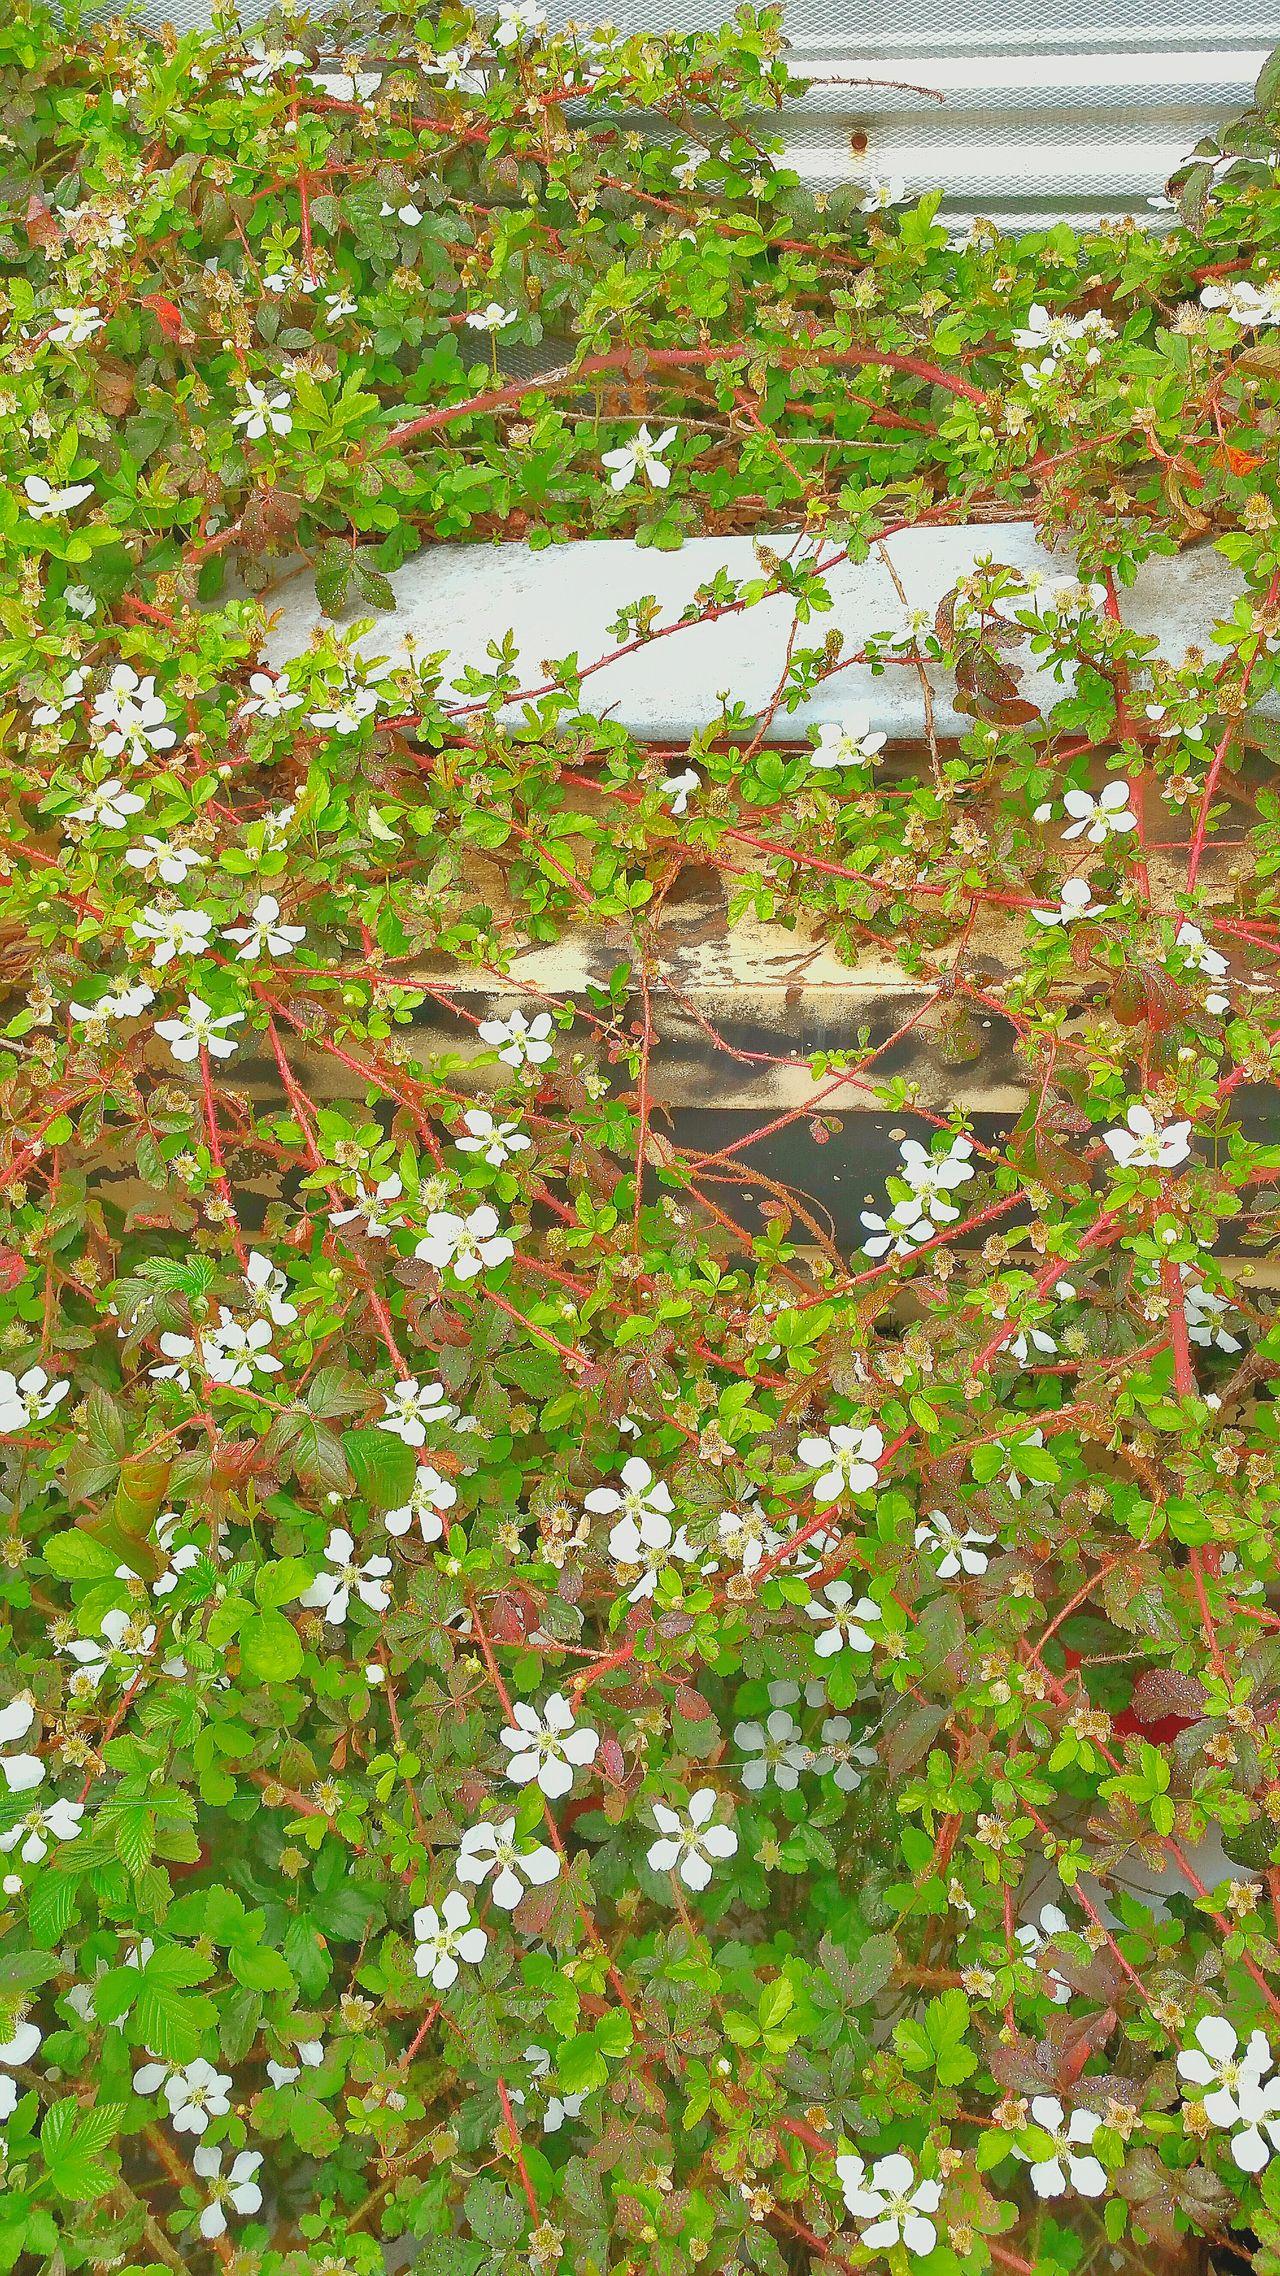 Urban Spring Fever Vines Wild Blackberry Flowers Of EyeEm Determination Growing Over Building Dew Berries Metal Building Red Vines Watch For Thorns Springtime Flowers